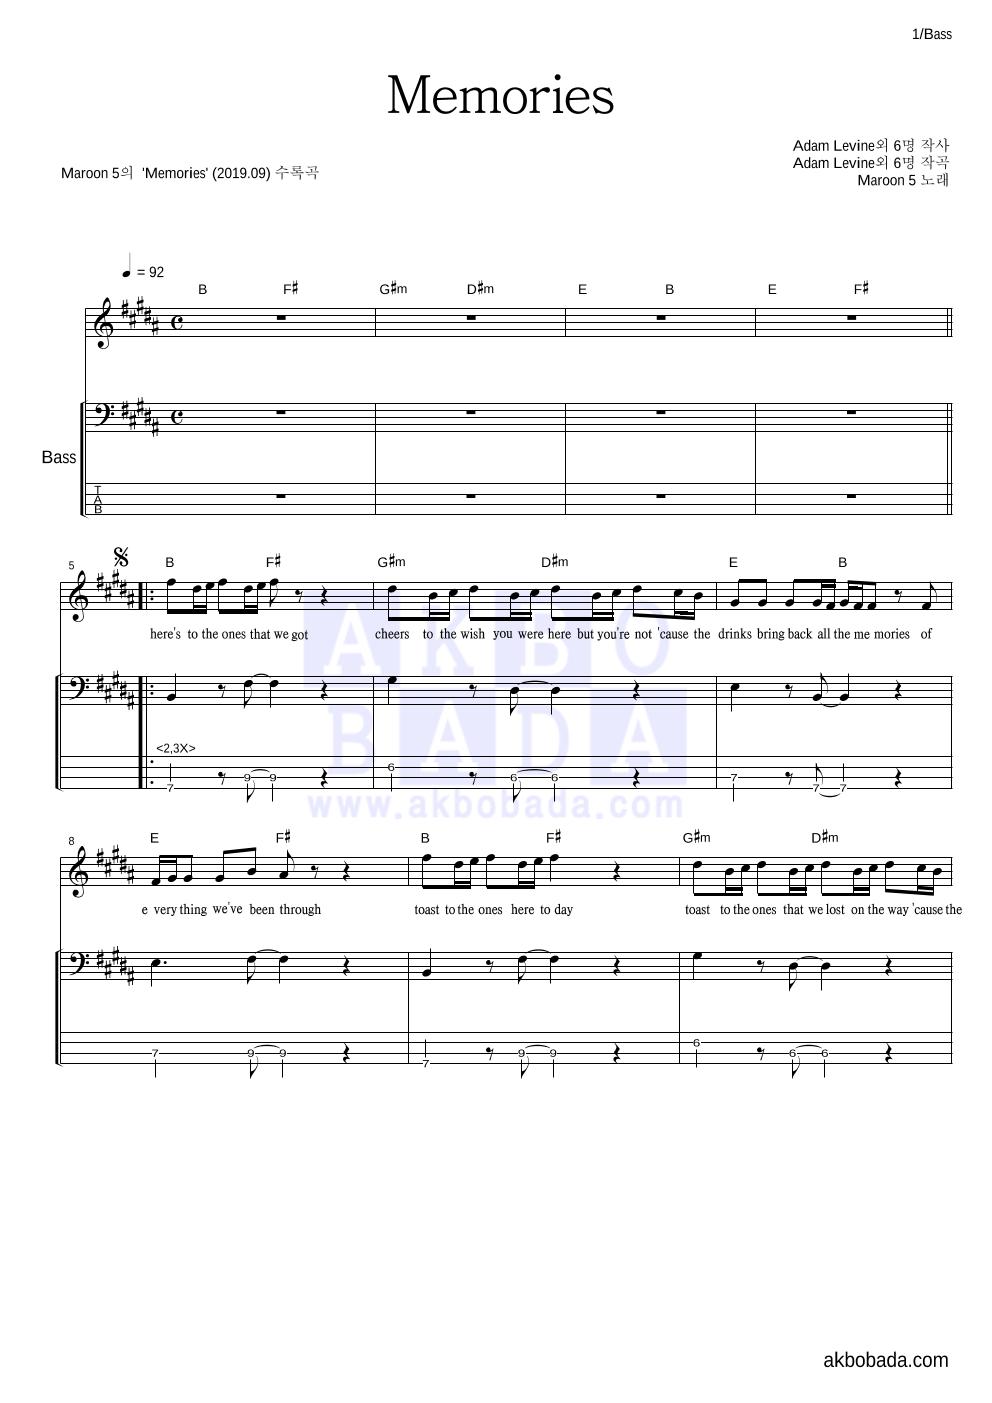 Maroon5 - Memories 베이스 악보